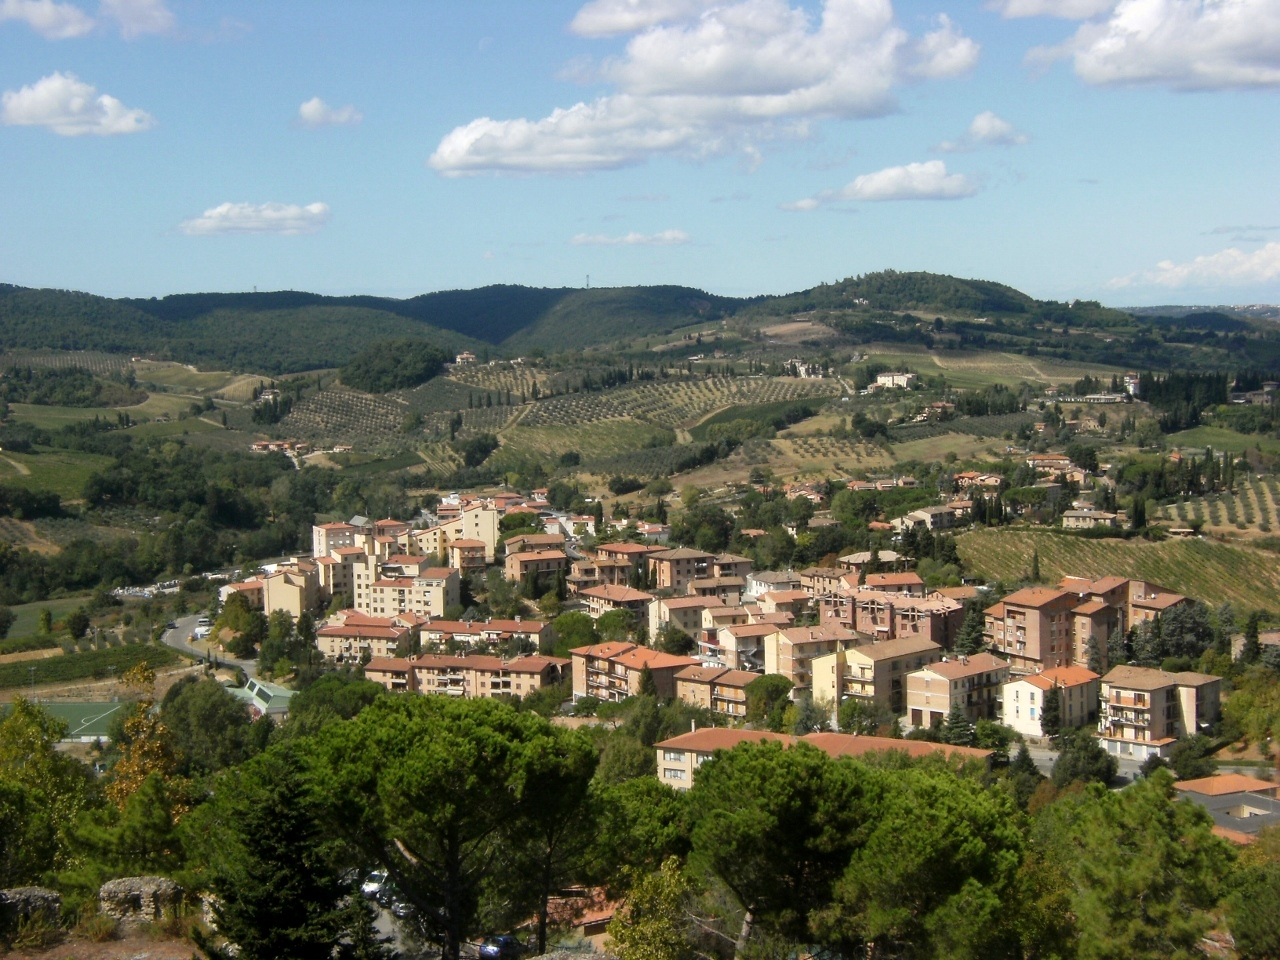 Italy - San Gimignano - 1 (1280x960)